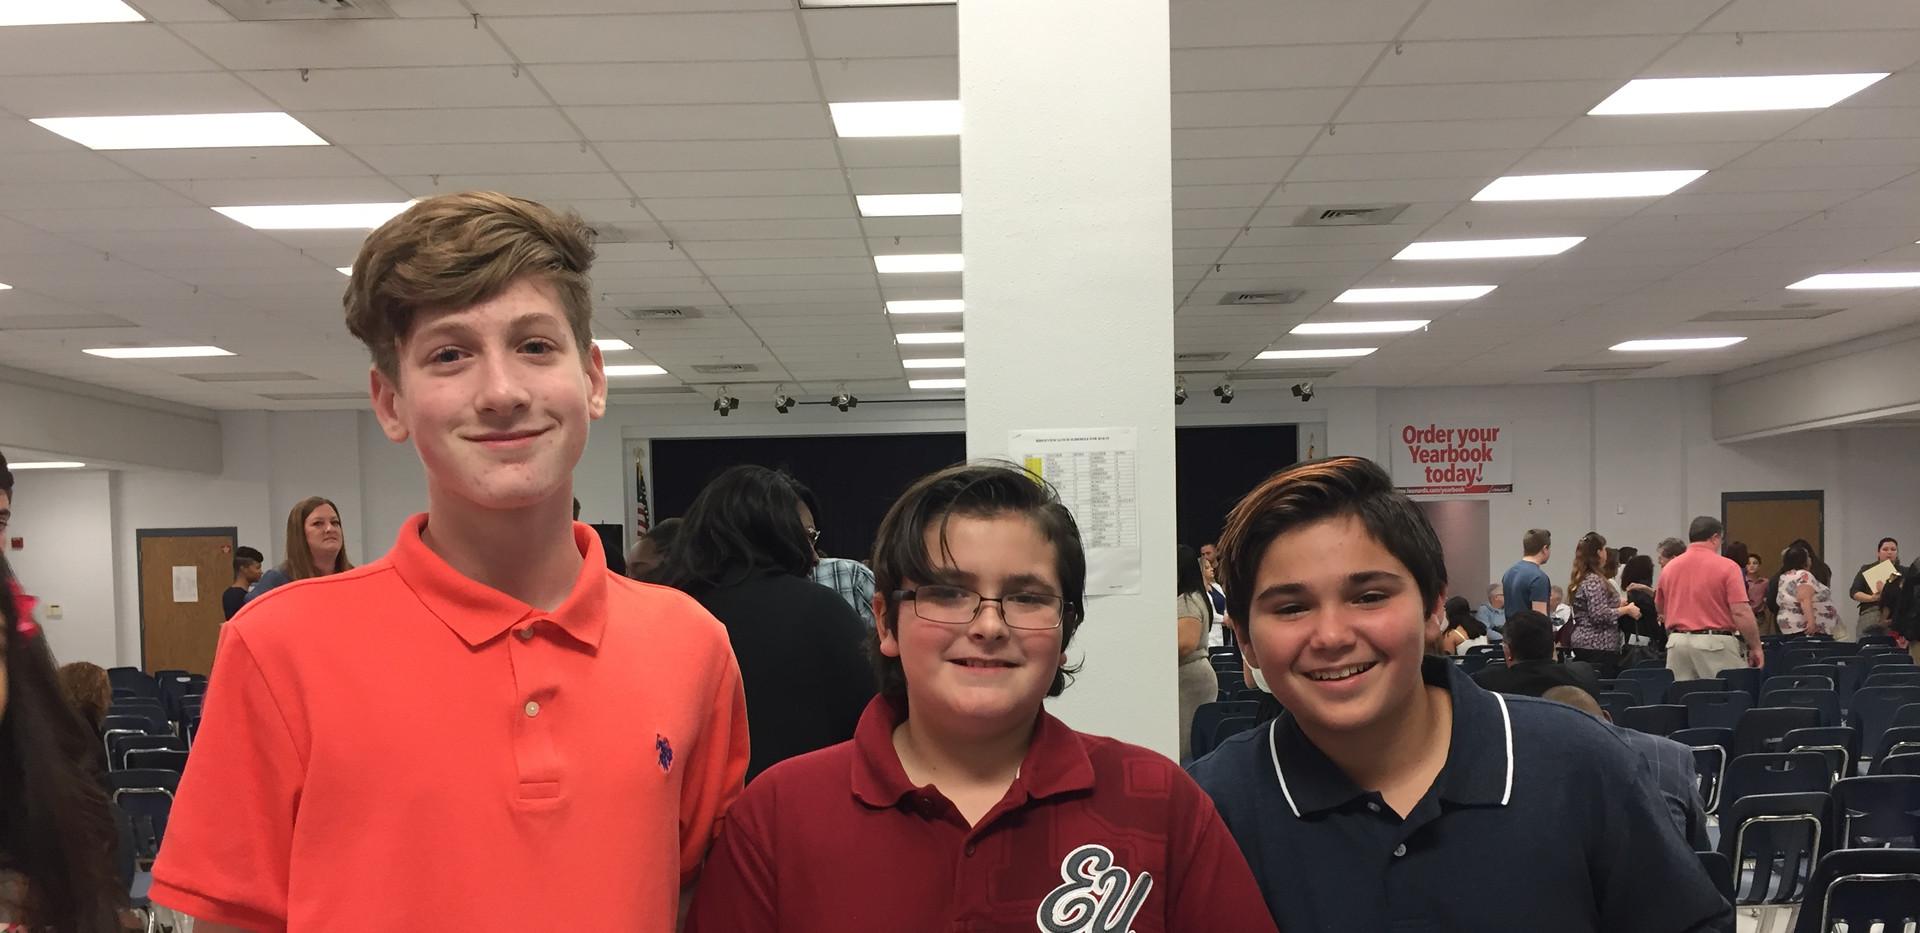 Deuce, Devin, & Cole